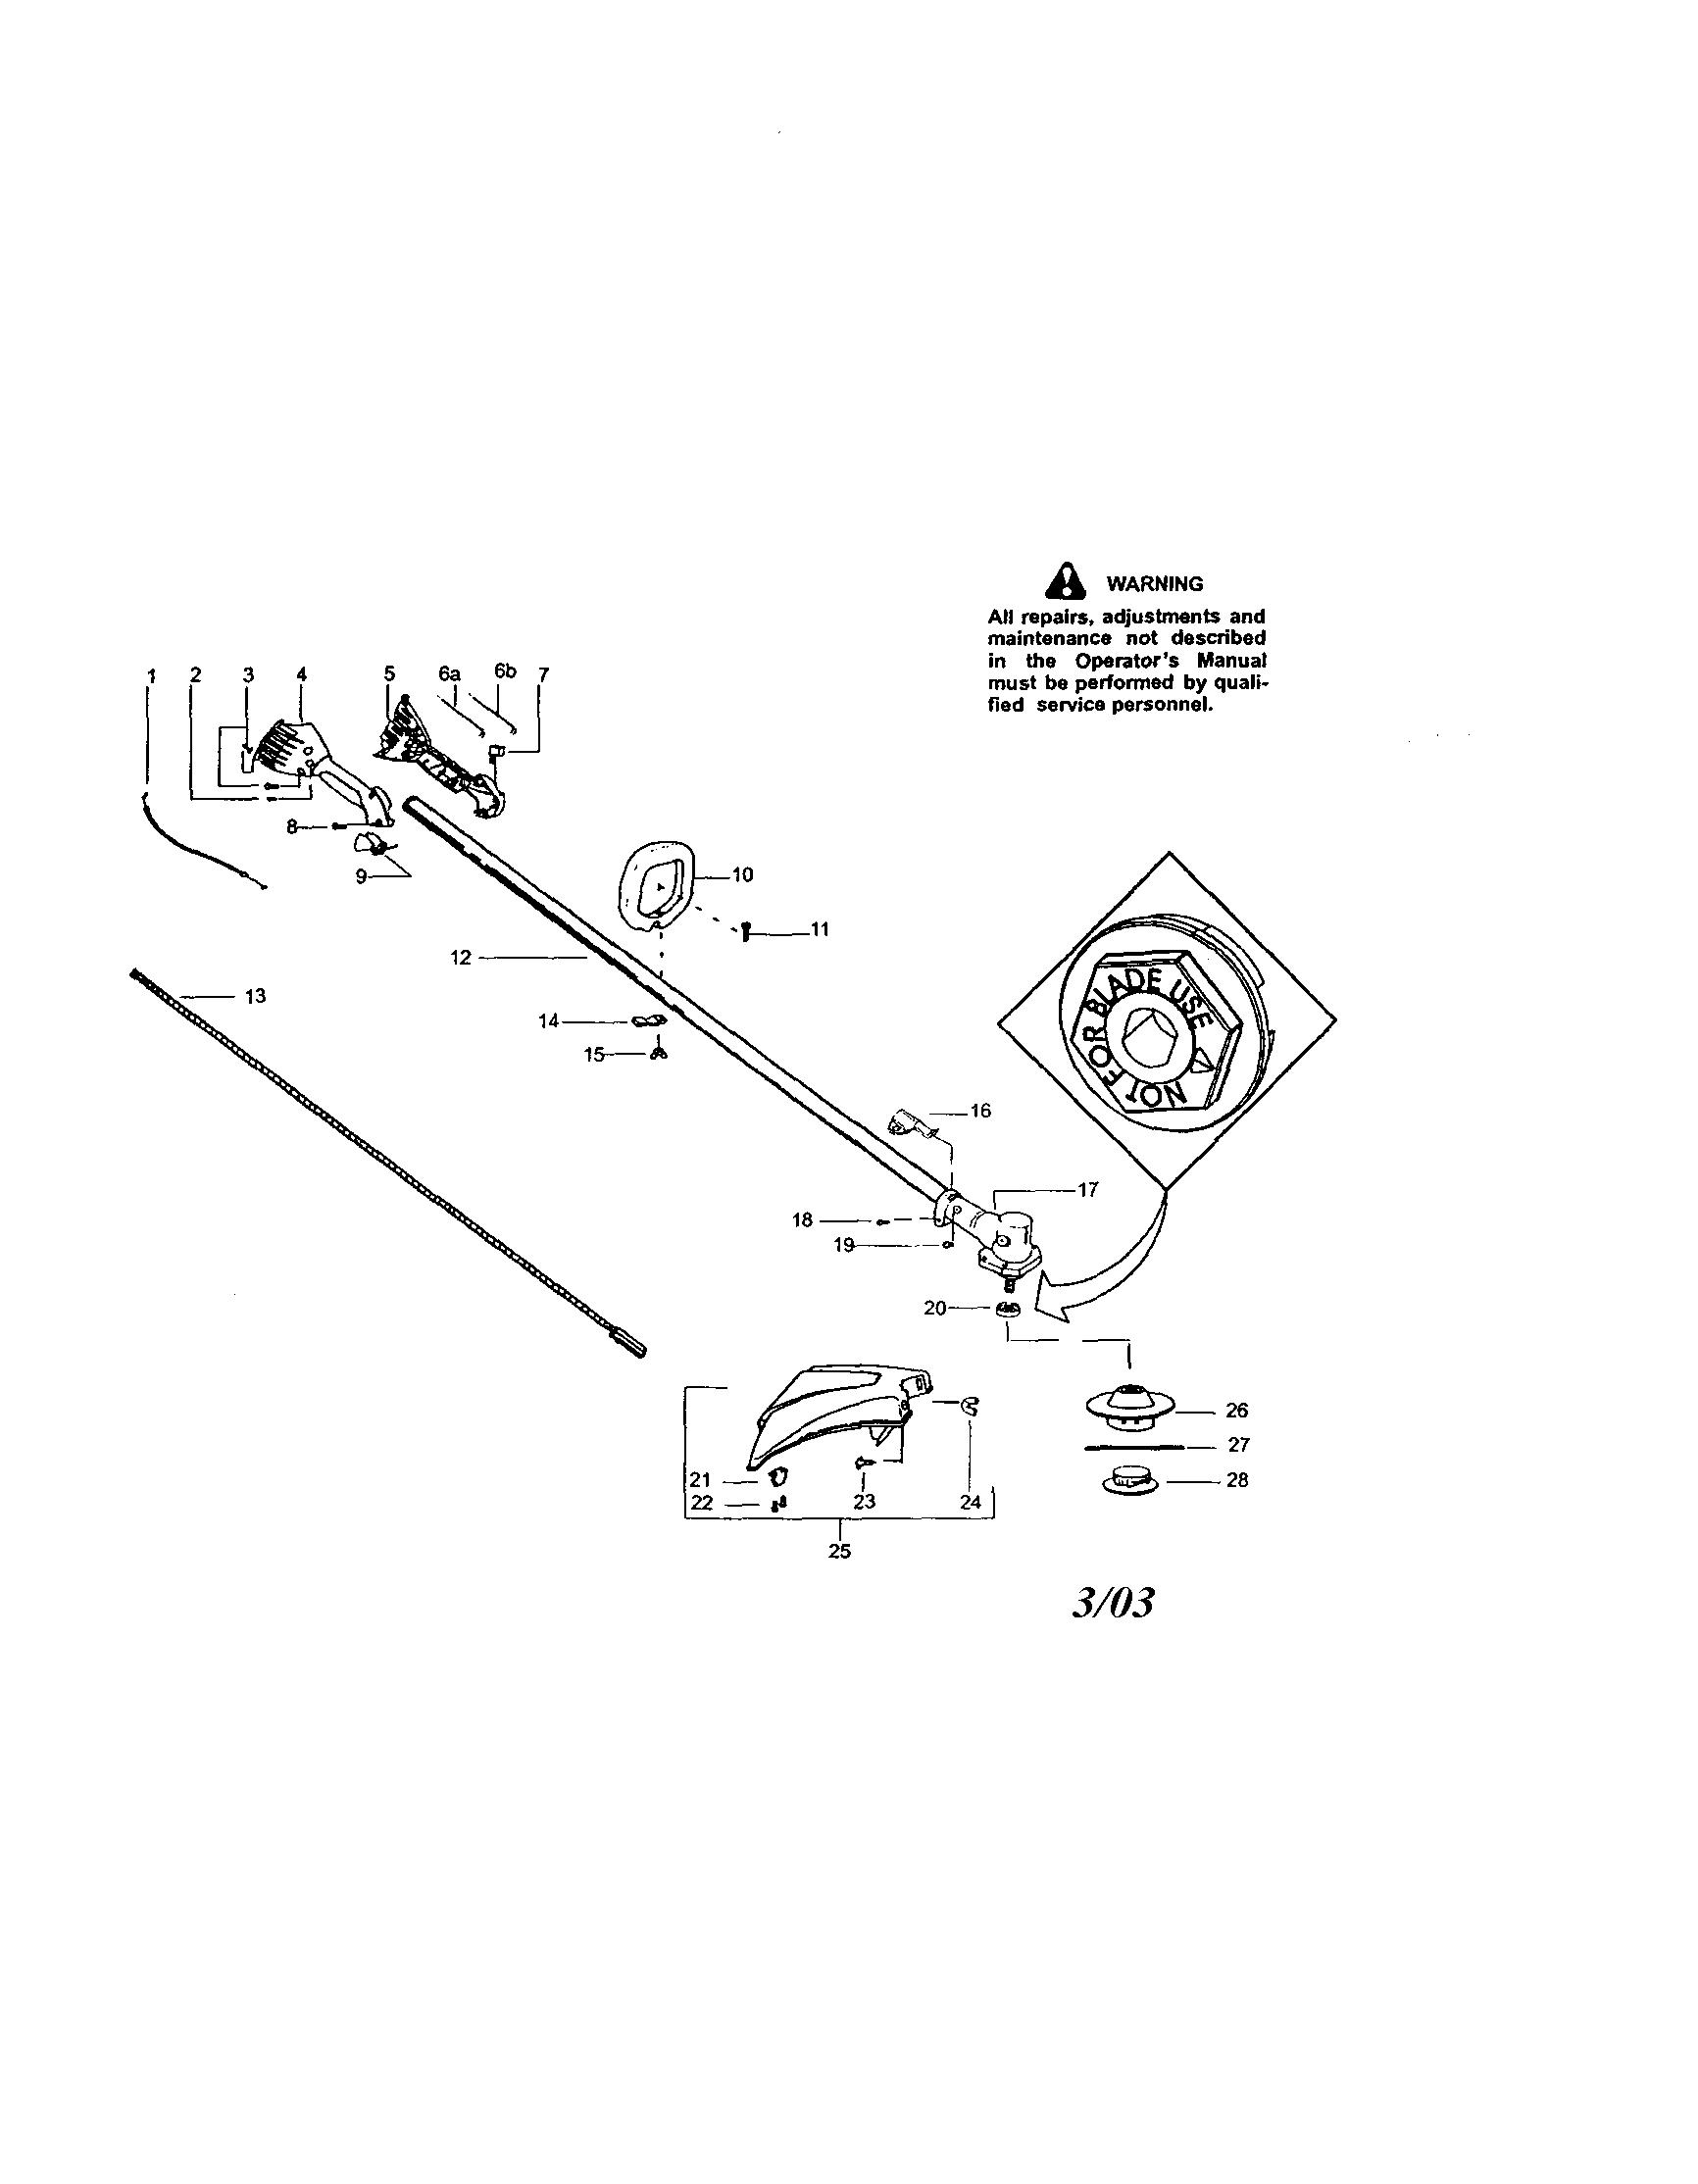 weed eater fuel line replacement diagram minn kota riptide wiring craftsman sears weedwacker parts model 358795560